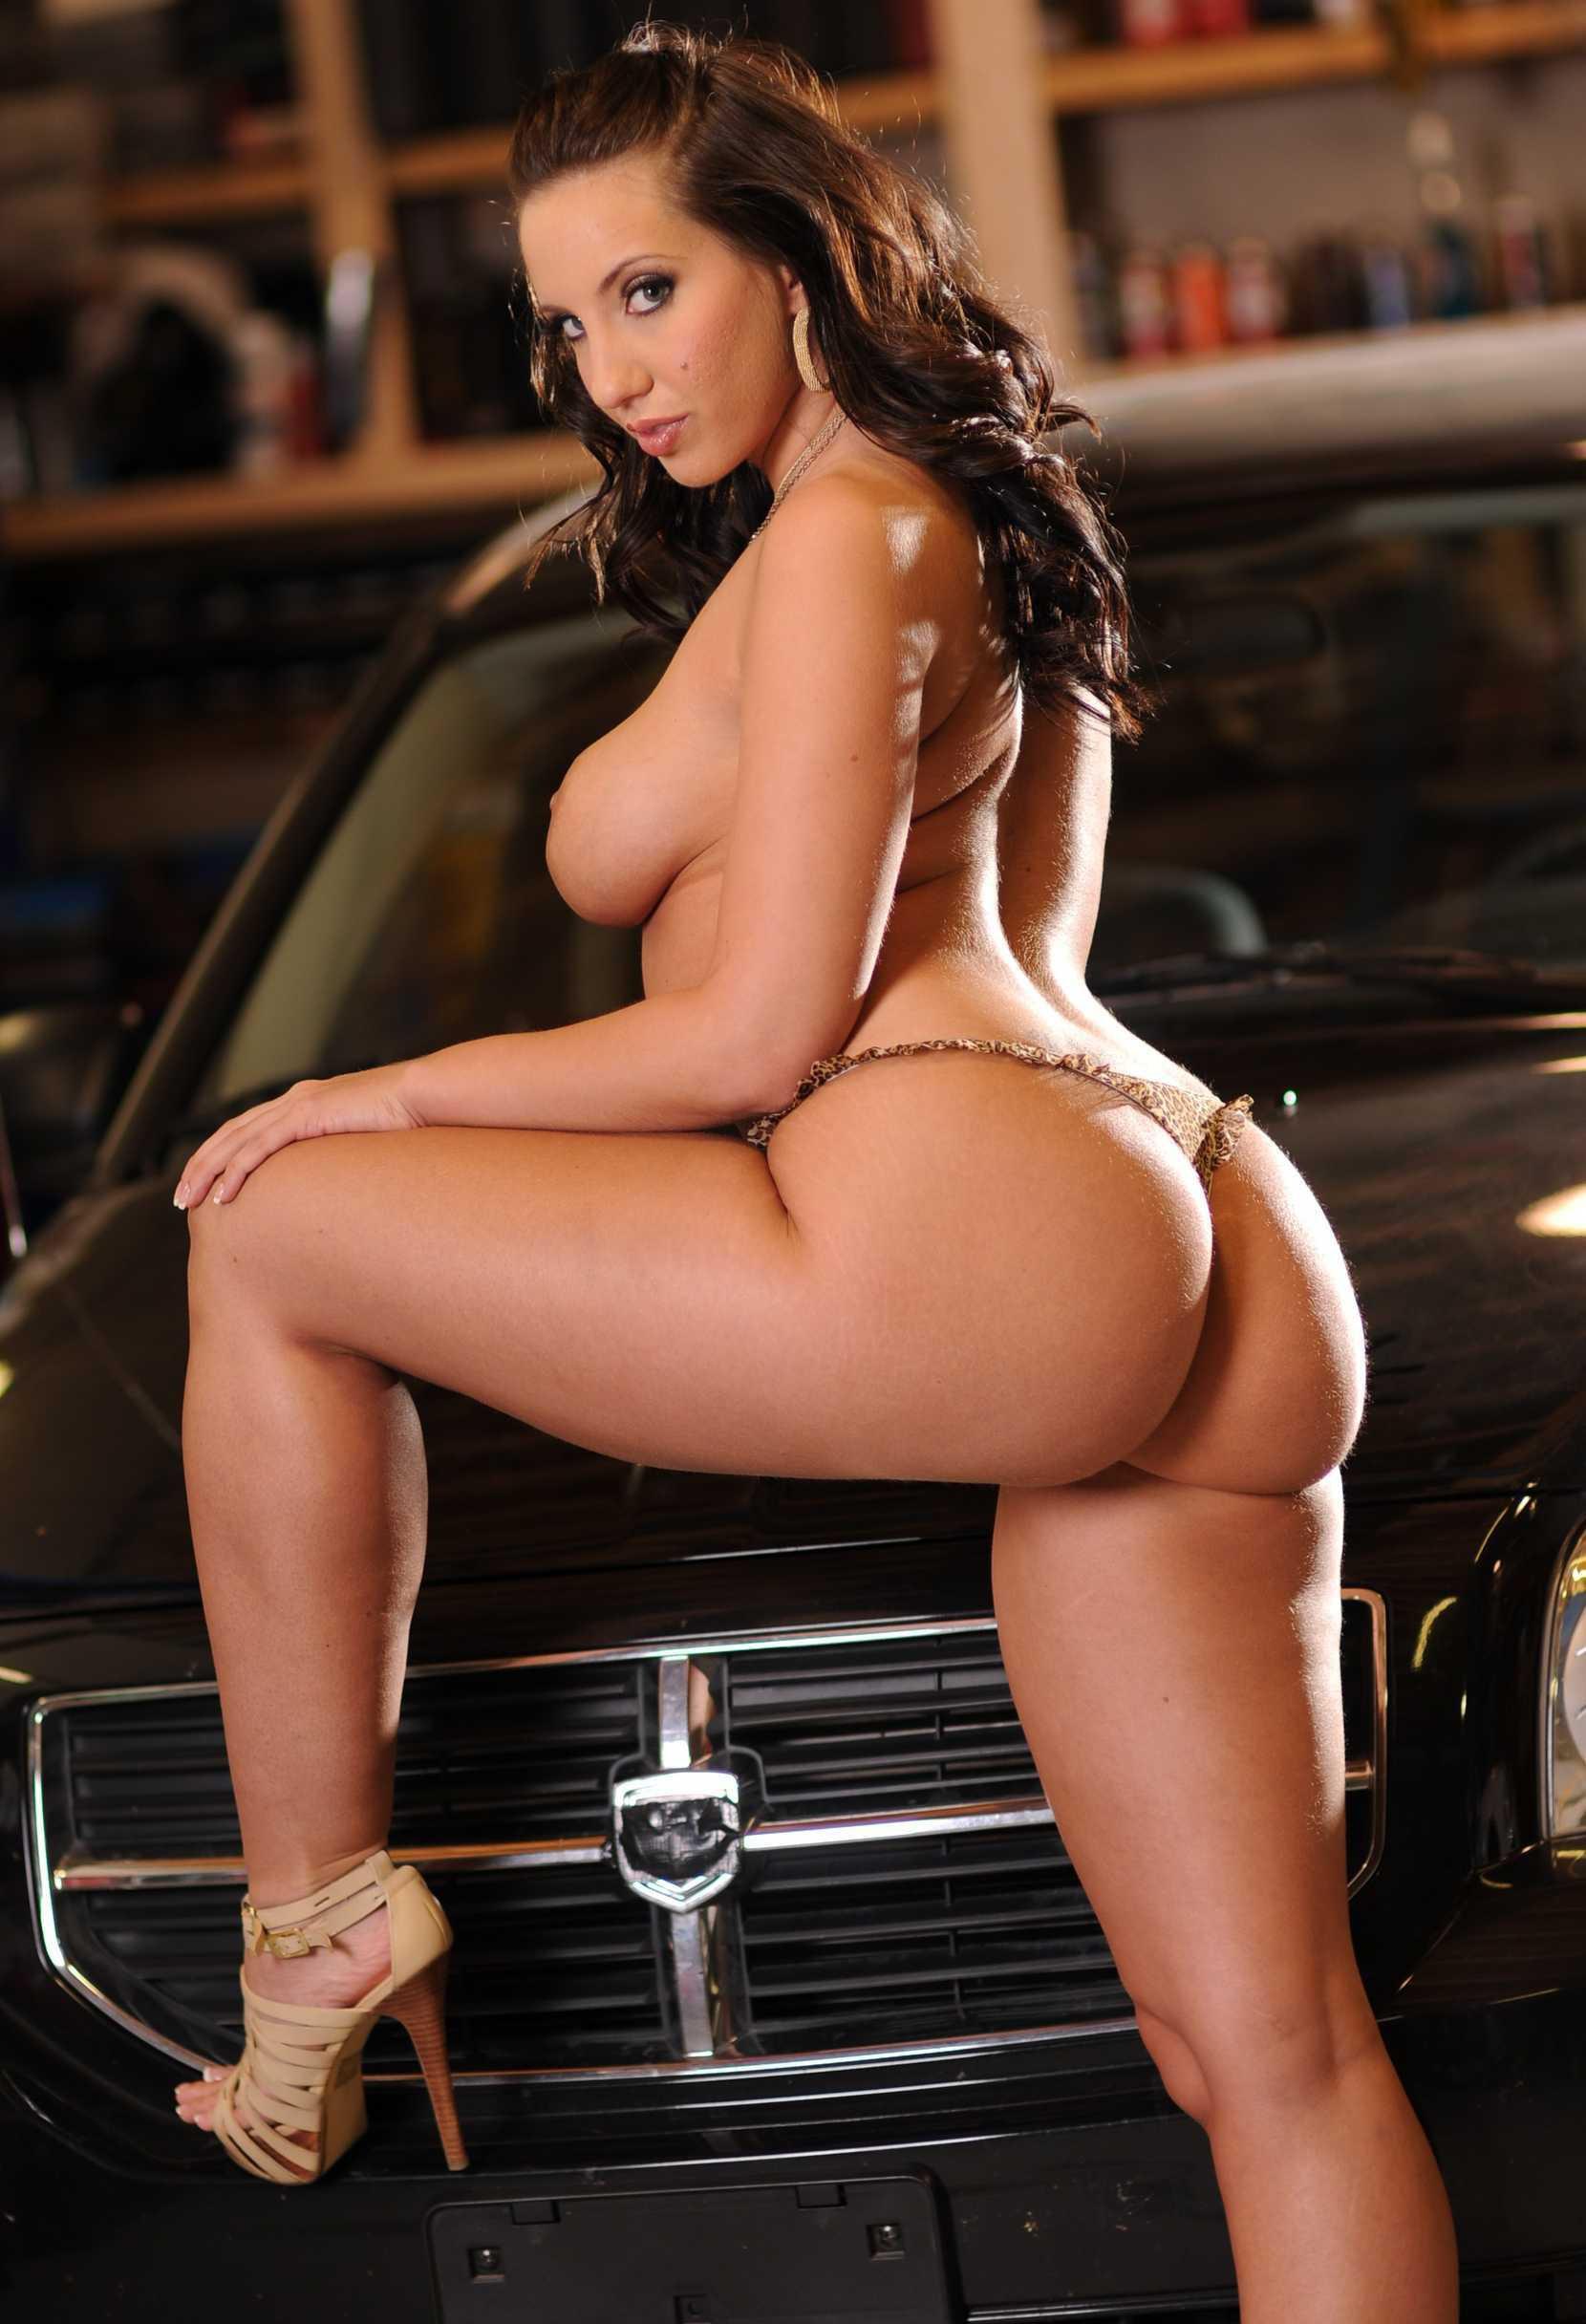 Sexy Photos Big Tits image #79593